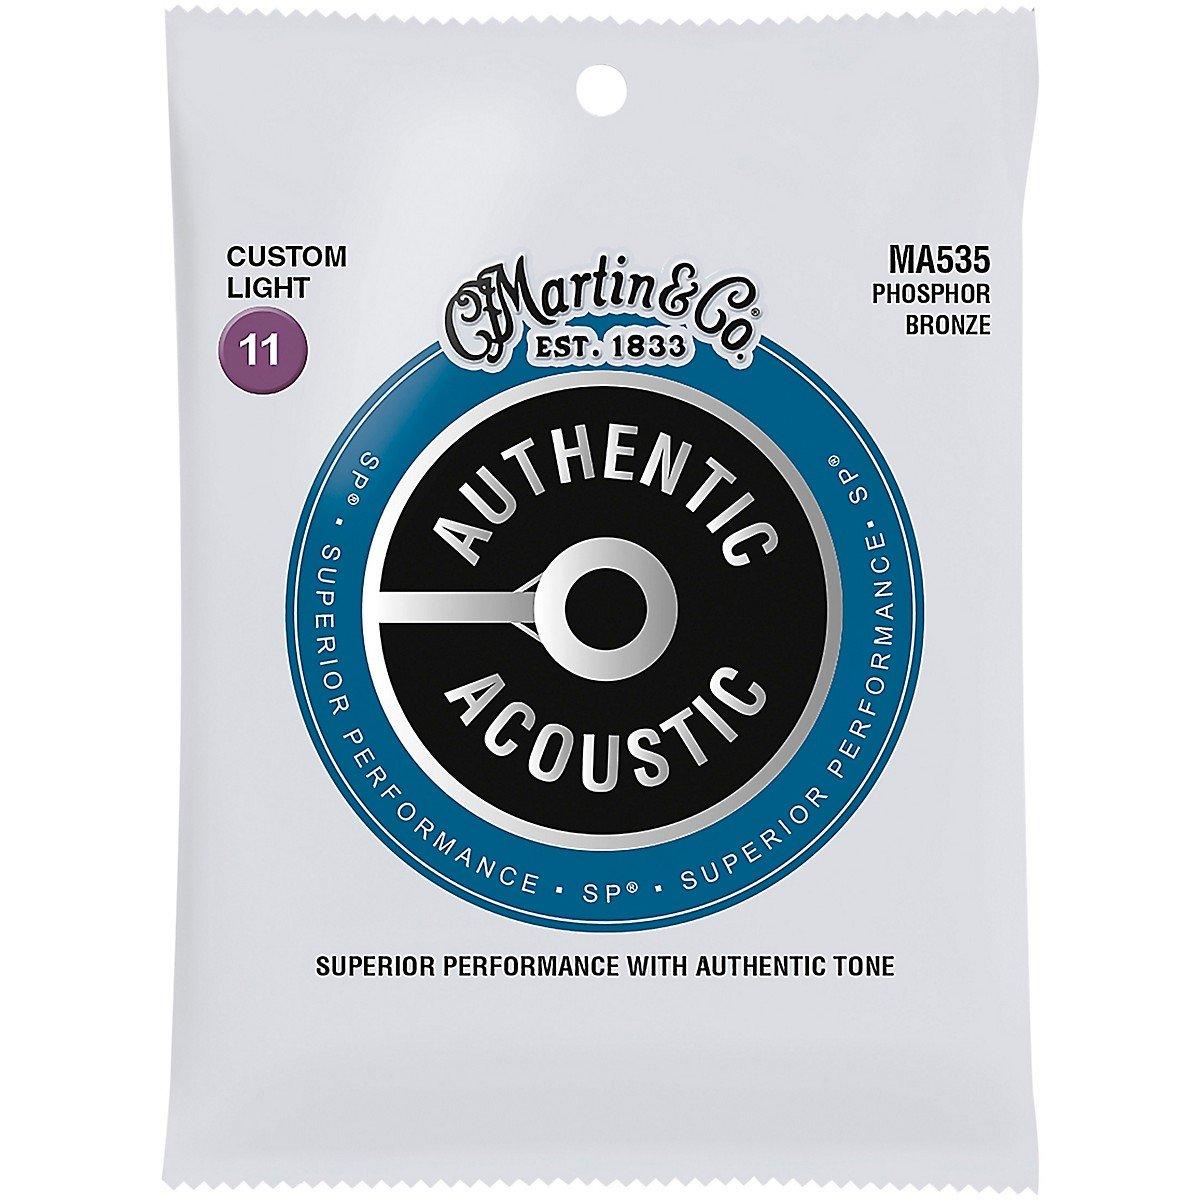 Martin MA535 Authentic Acoustic SP Phosphor Bronze Acoustic Guitar Strings, Custom Light 11-52